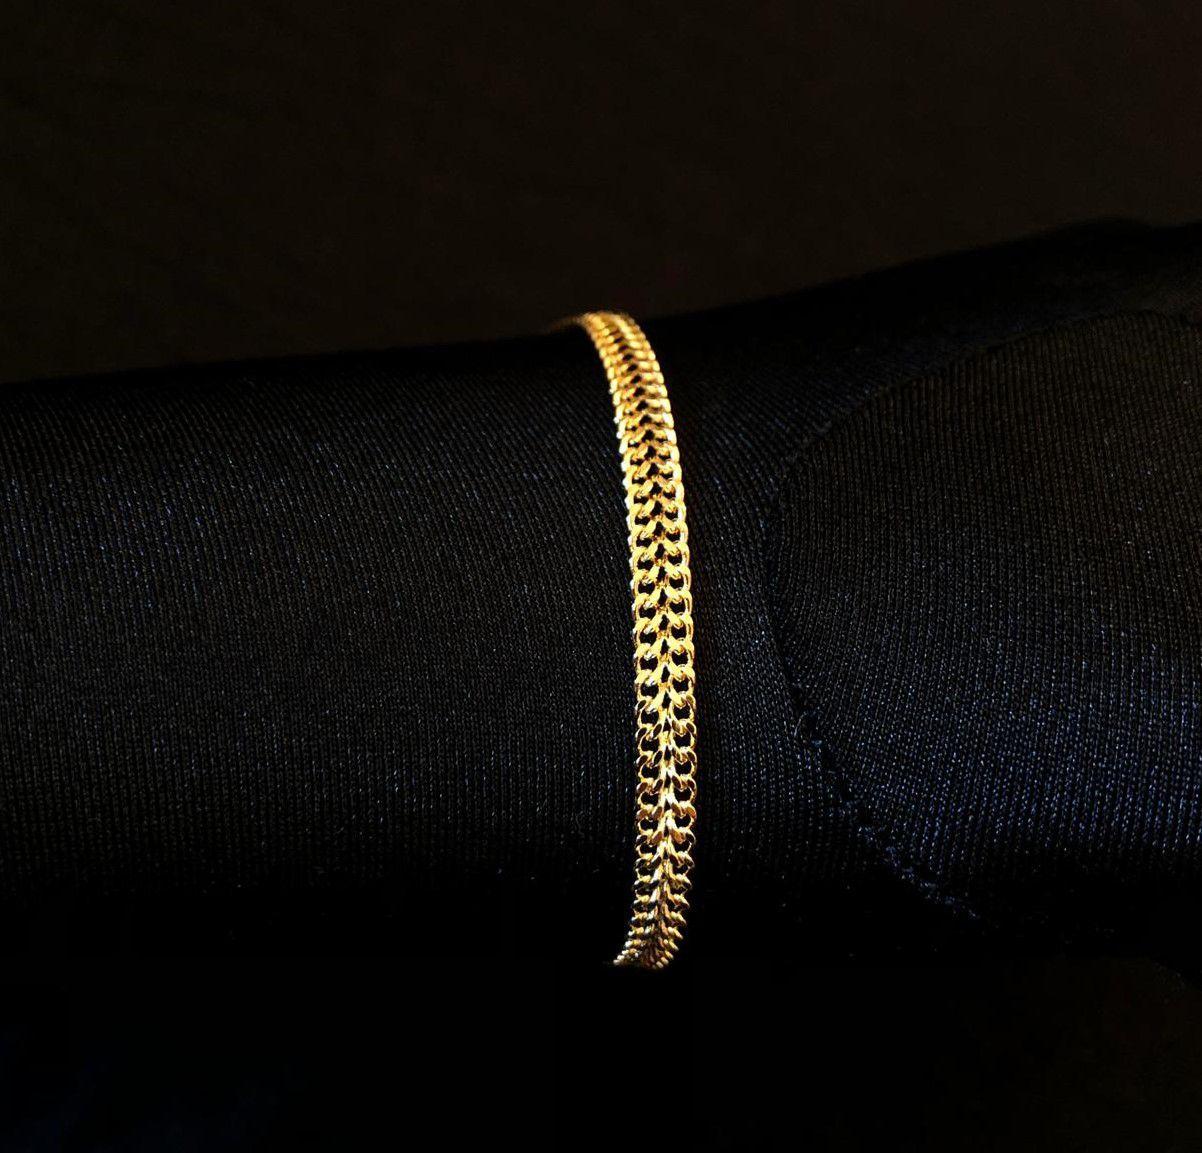 Pulseira Grumet Union 4mm (Fecho Gaveta) (Banho Ouro 24k)